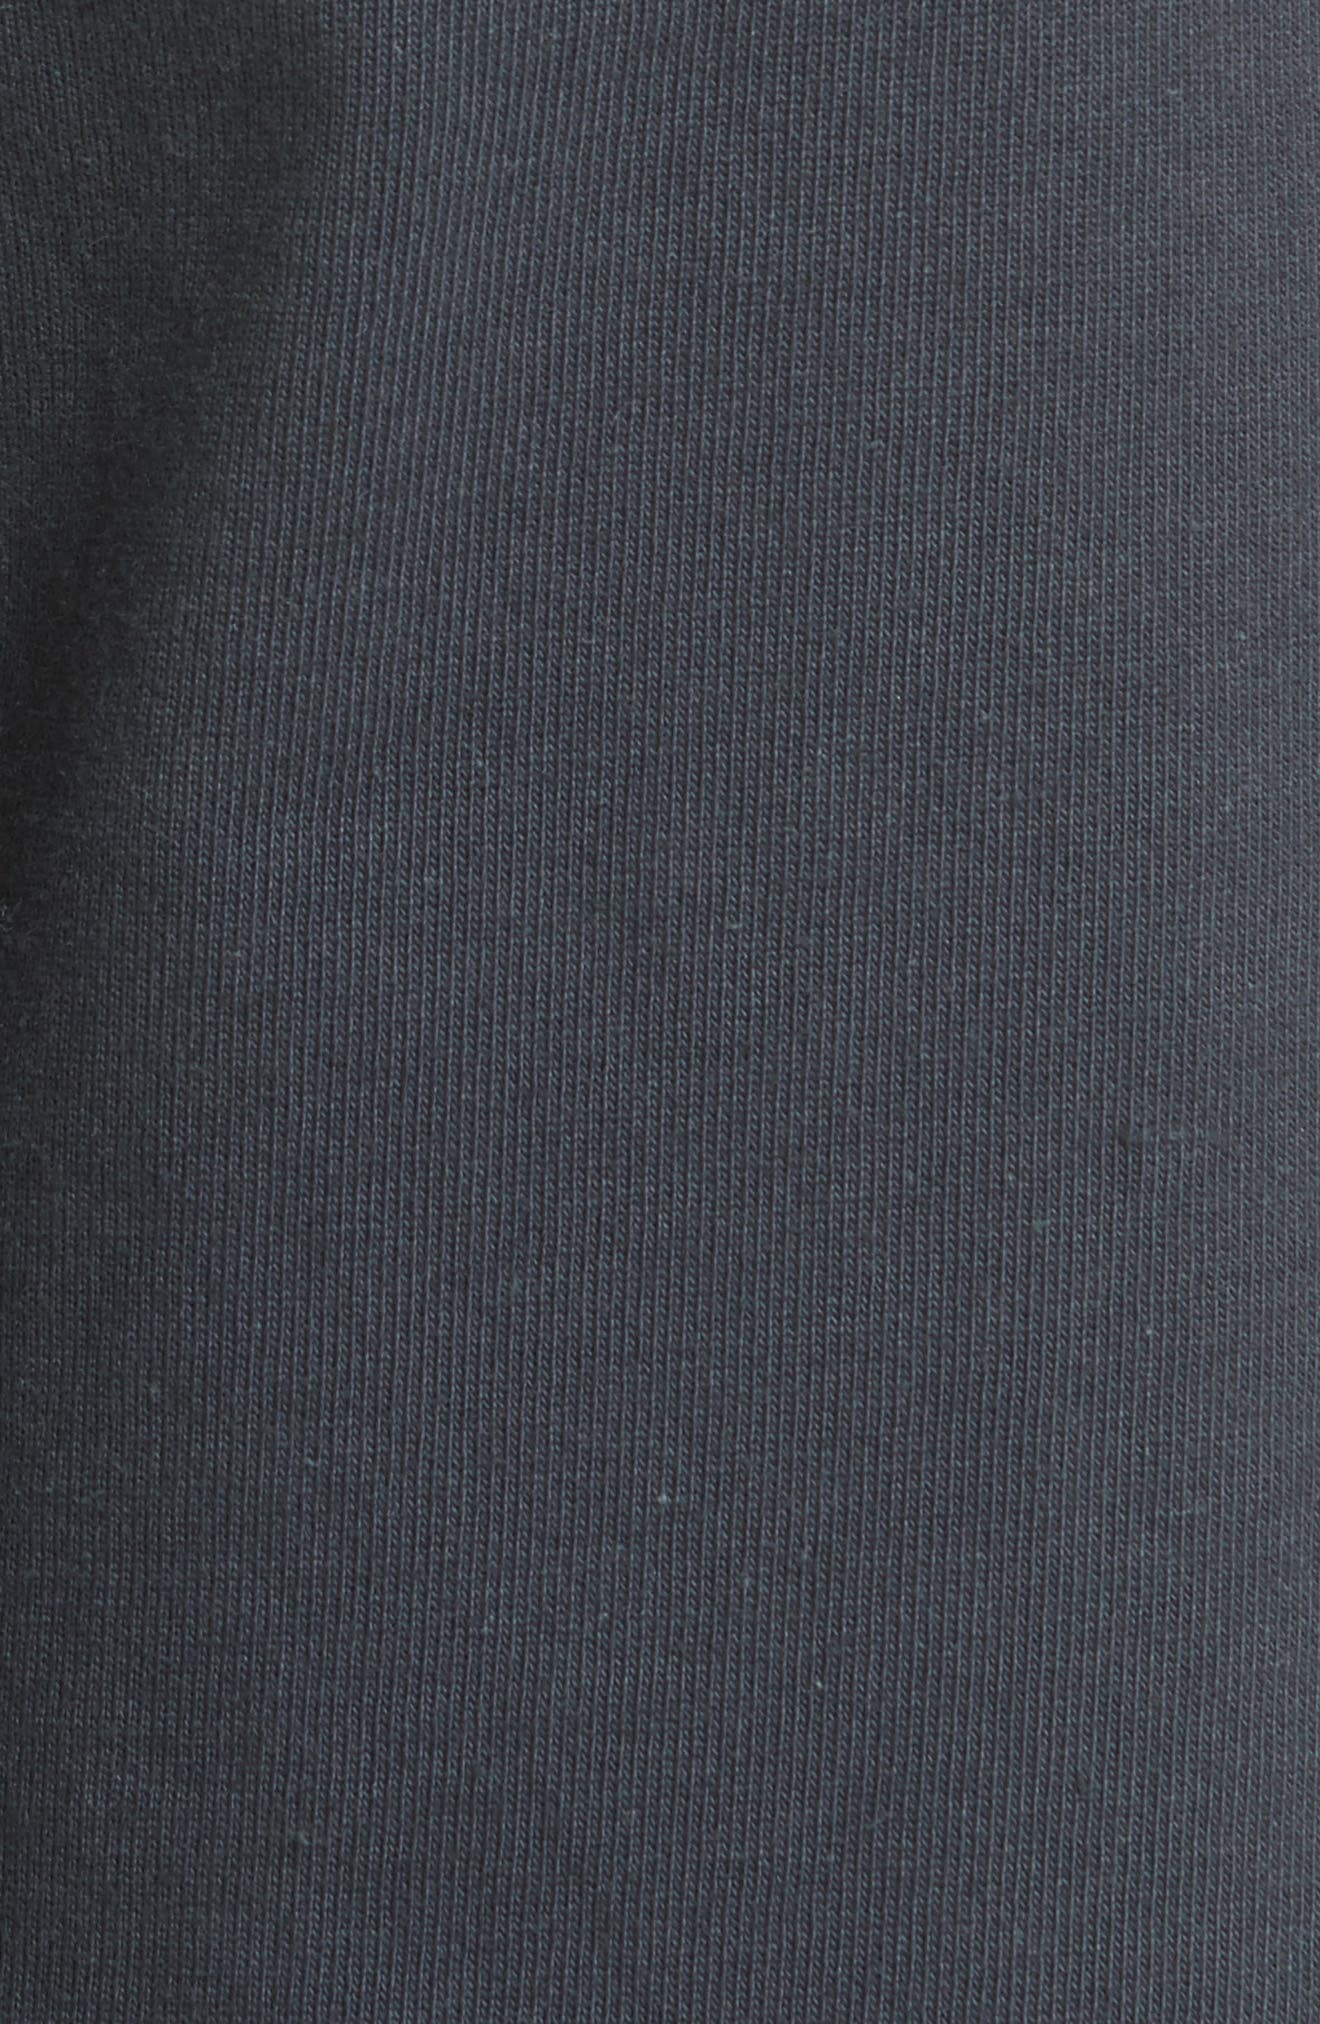 Green Park Jersey Shorts,                             Alternate thumbnail 5, color,                             020